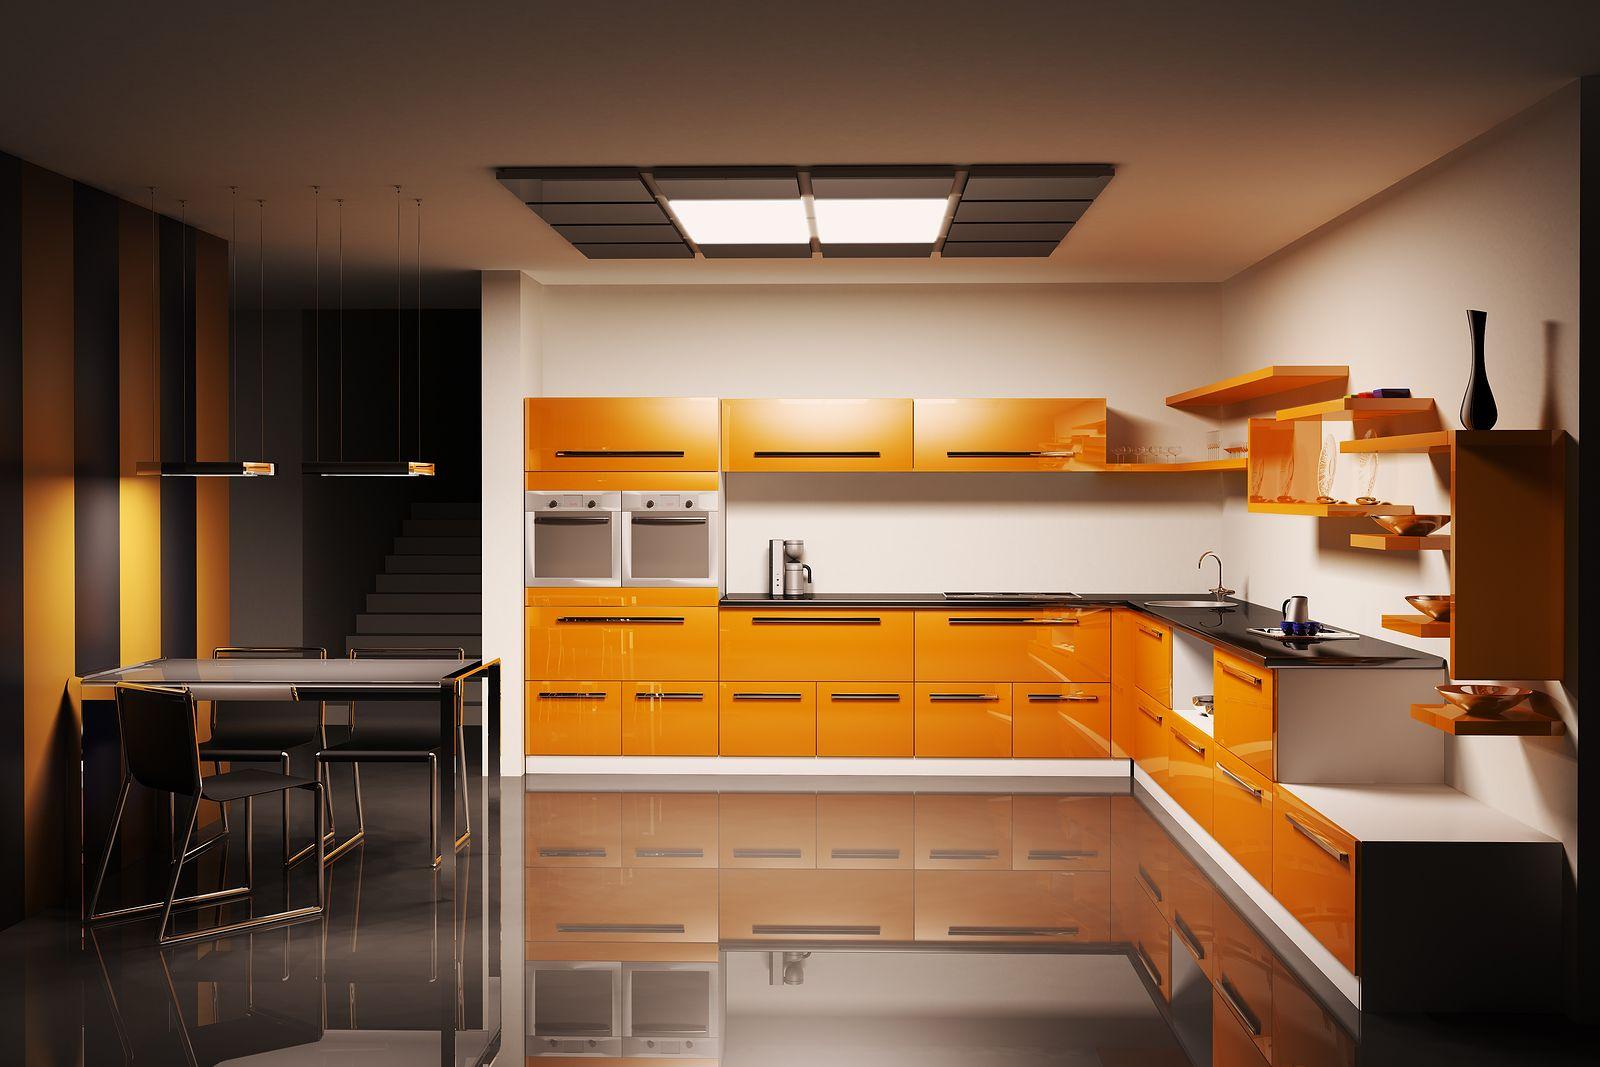 Kitchen wall lighting Photo - 10